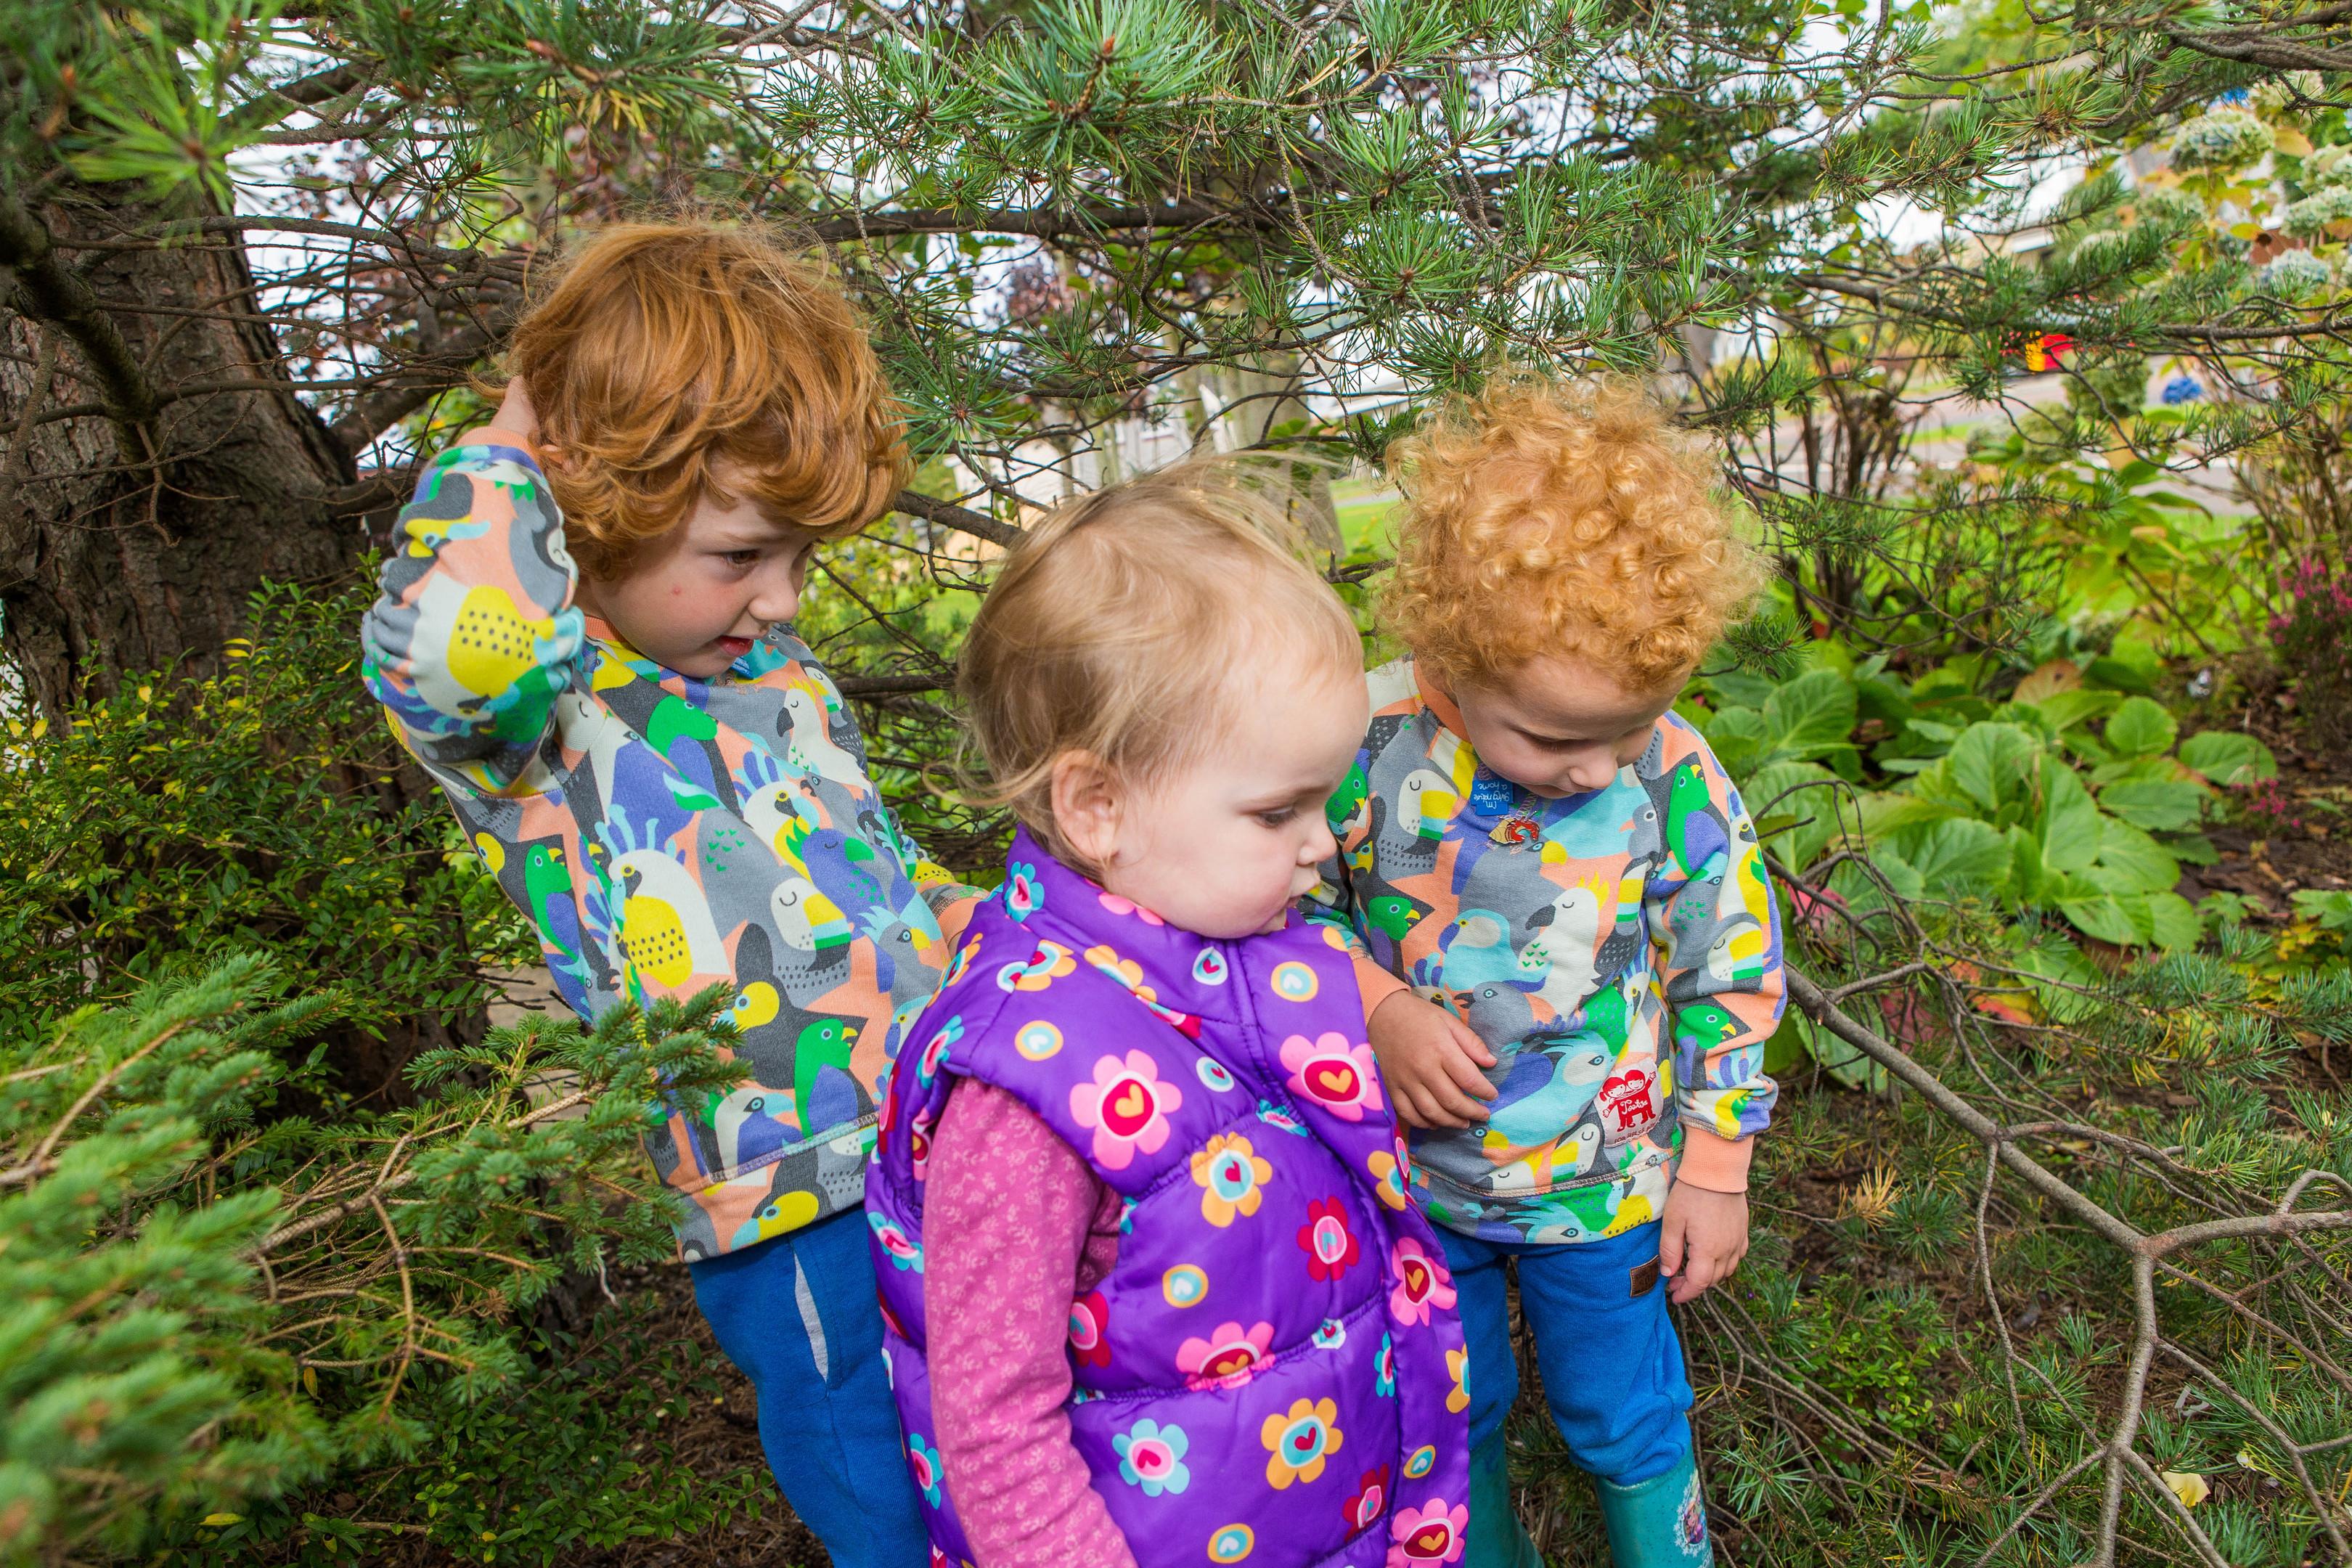 Jamie Allan (5), Robbie Allan (3) and Sabiha Ricks (2) explore the trees